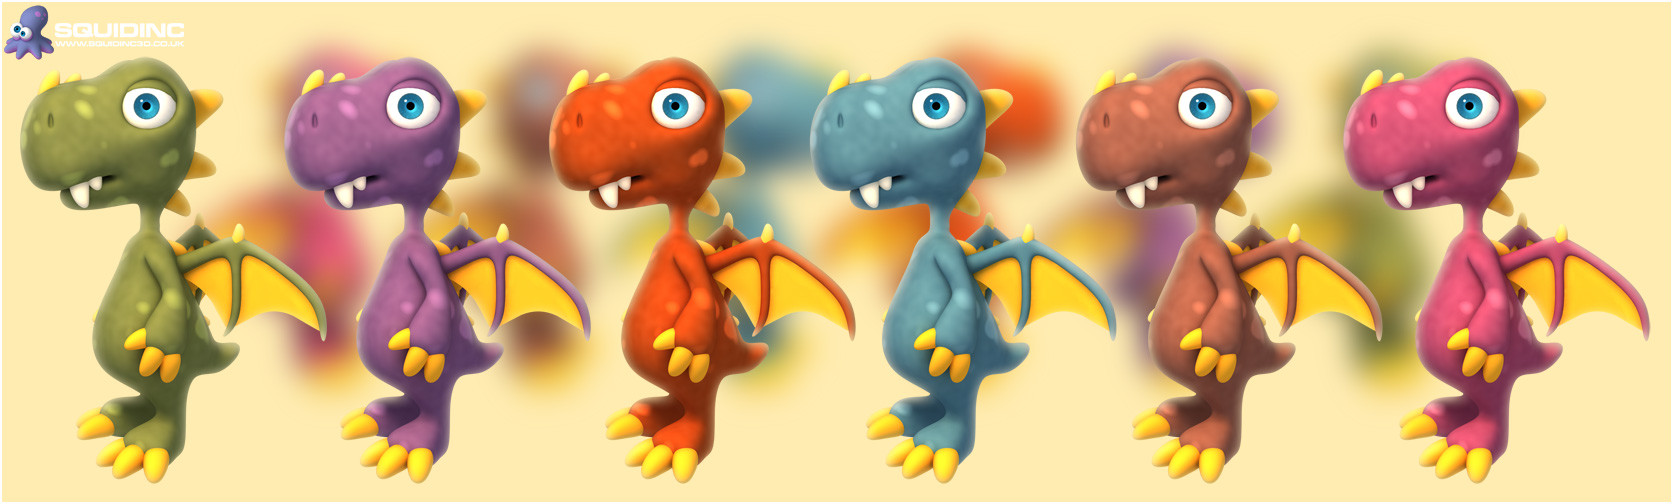 Mike robinson colour dragons